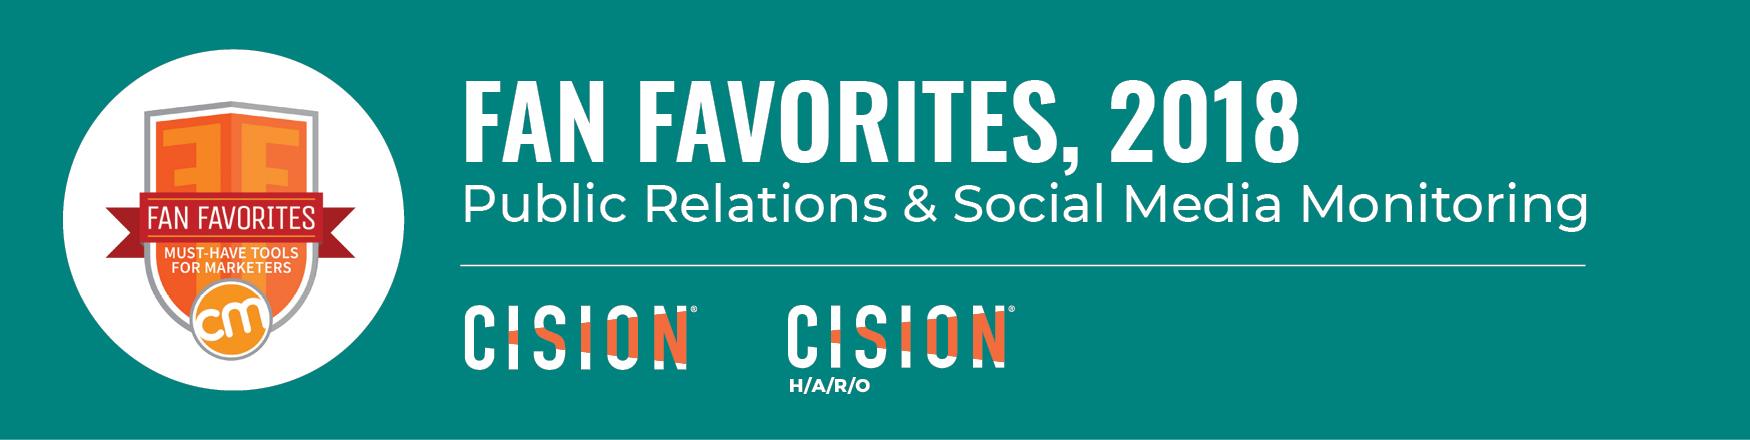 Cision Content Marketing Institute Fan Favorite.jpg